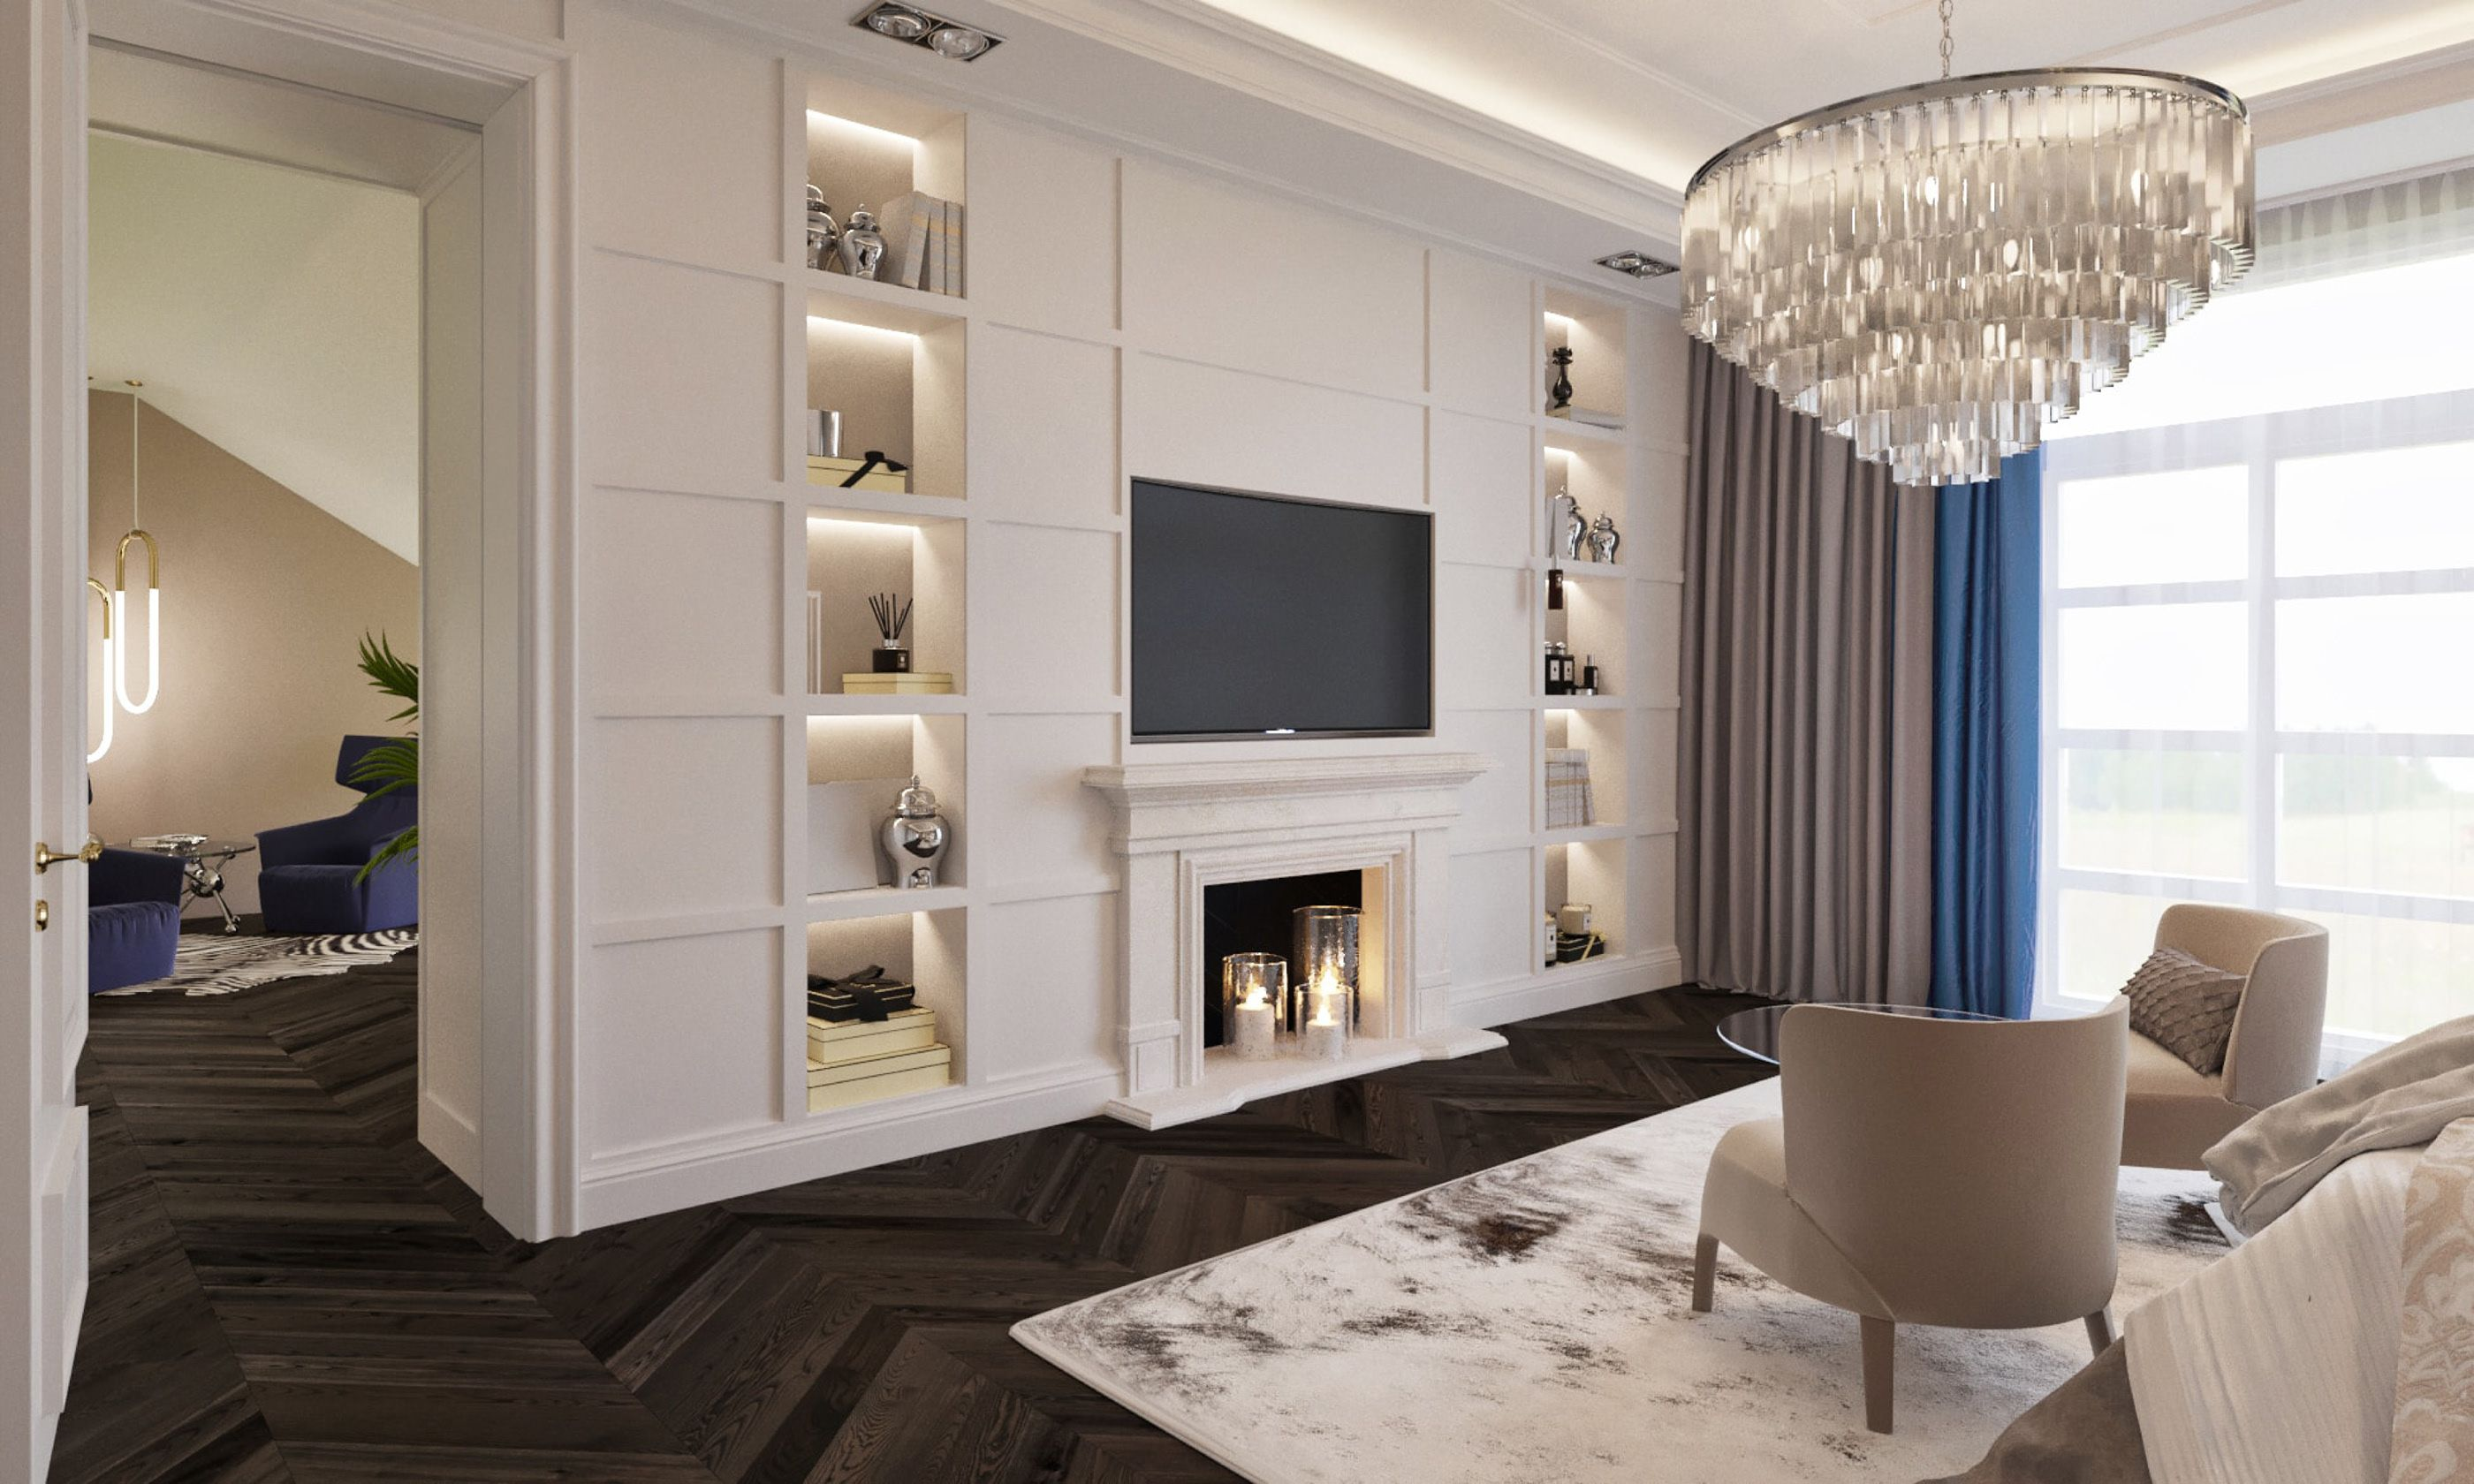 Duplex interior on Behance | Condo interior, Home design ...